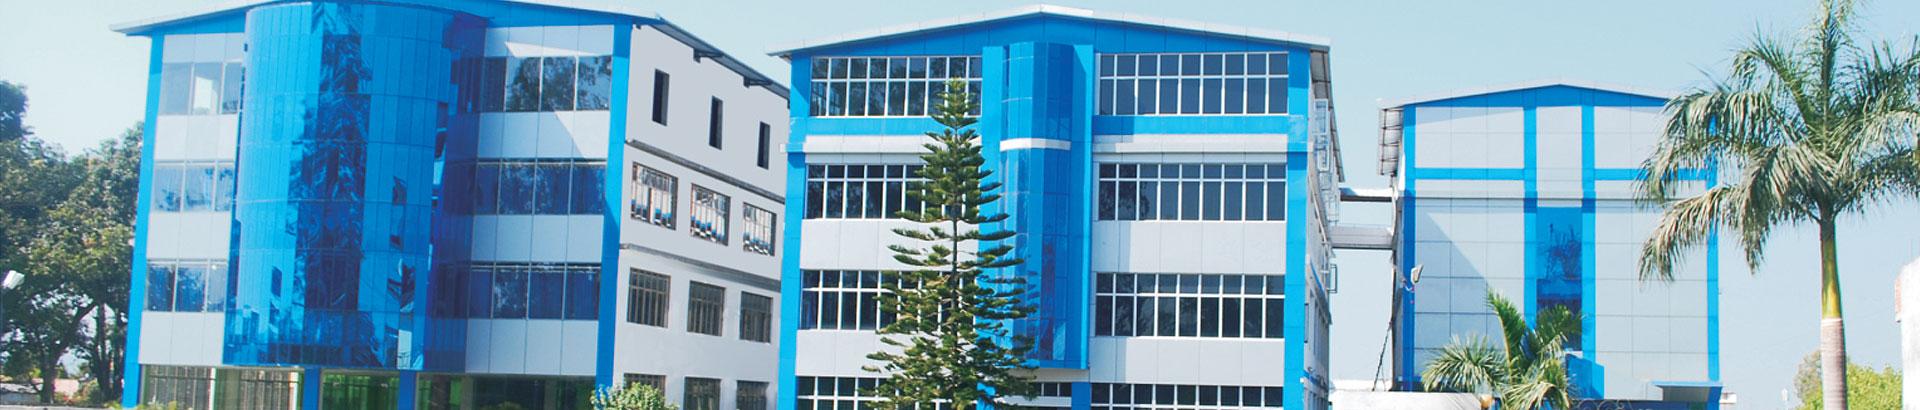 Uttaranchal P.G. College of Biomedical Sciences and Hospital, Dehradun Image